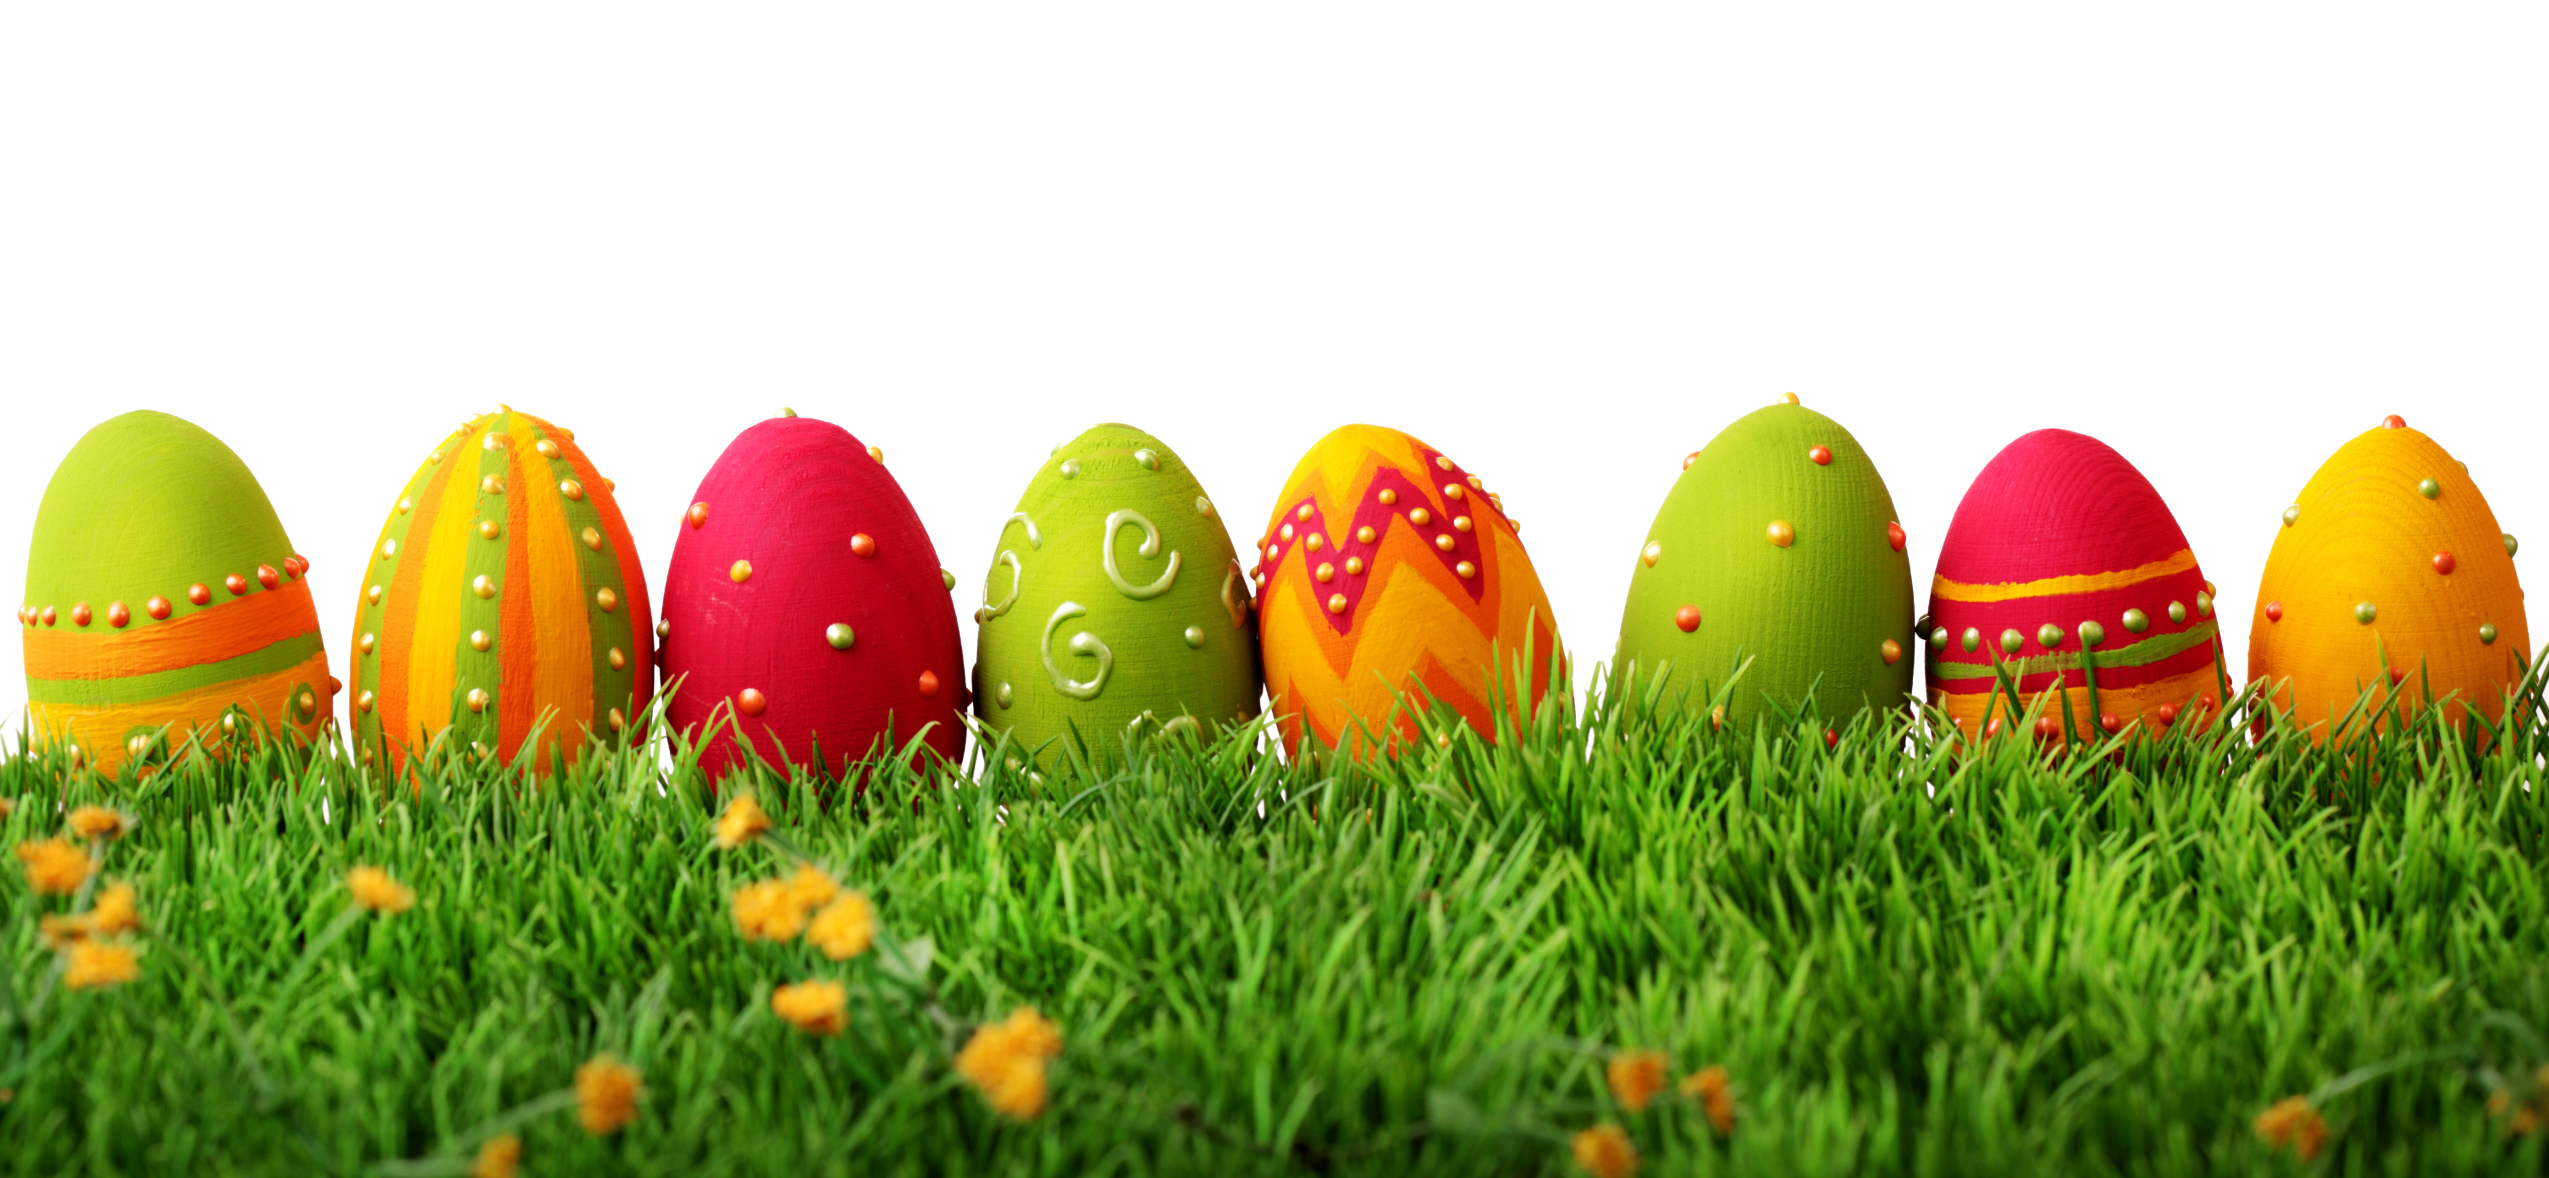 Colorful easter eggs   HD Desktop Wallpapers 4k HD 2549x1178